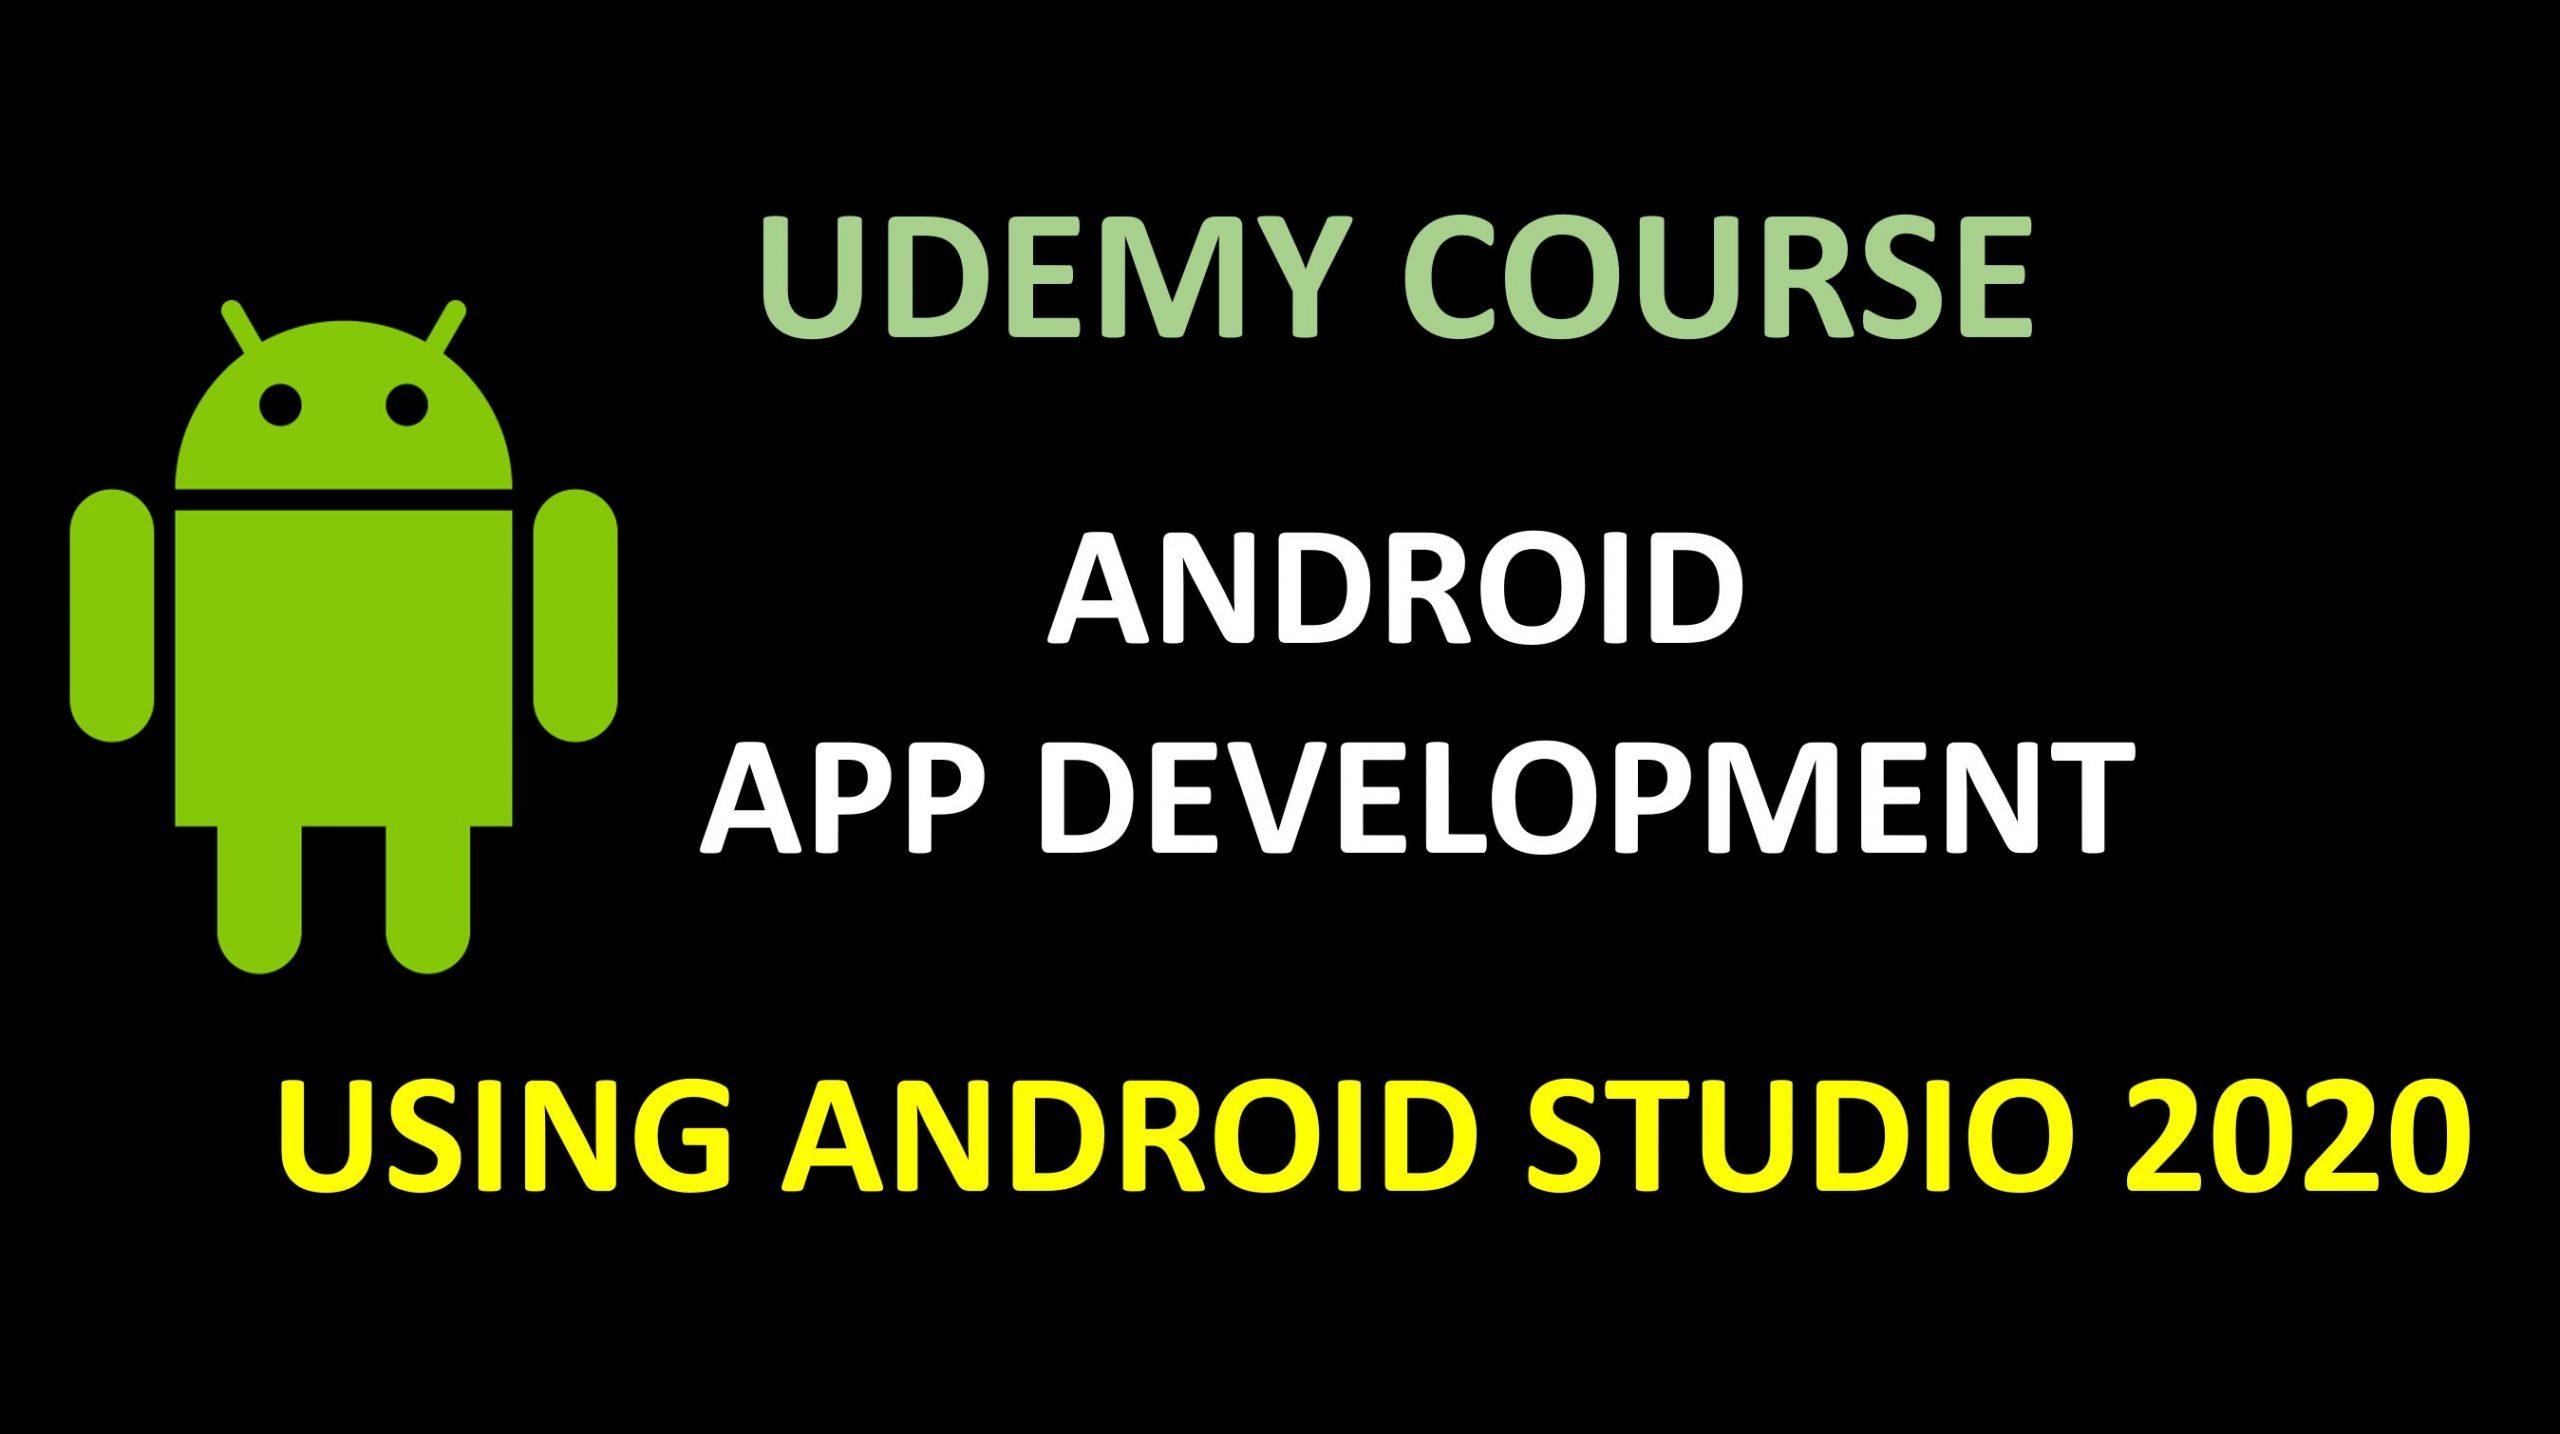 Android App Development using Android Studio 2020 - Beginner